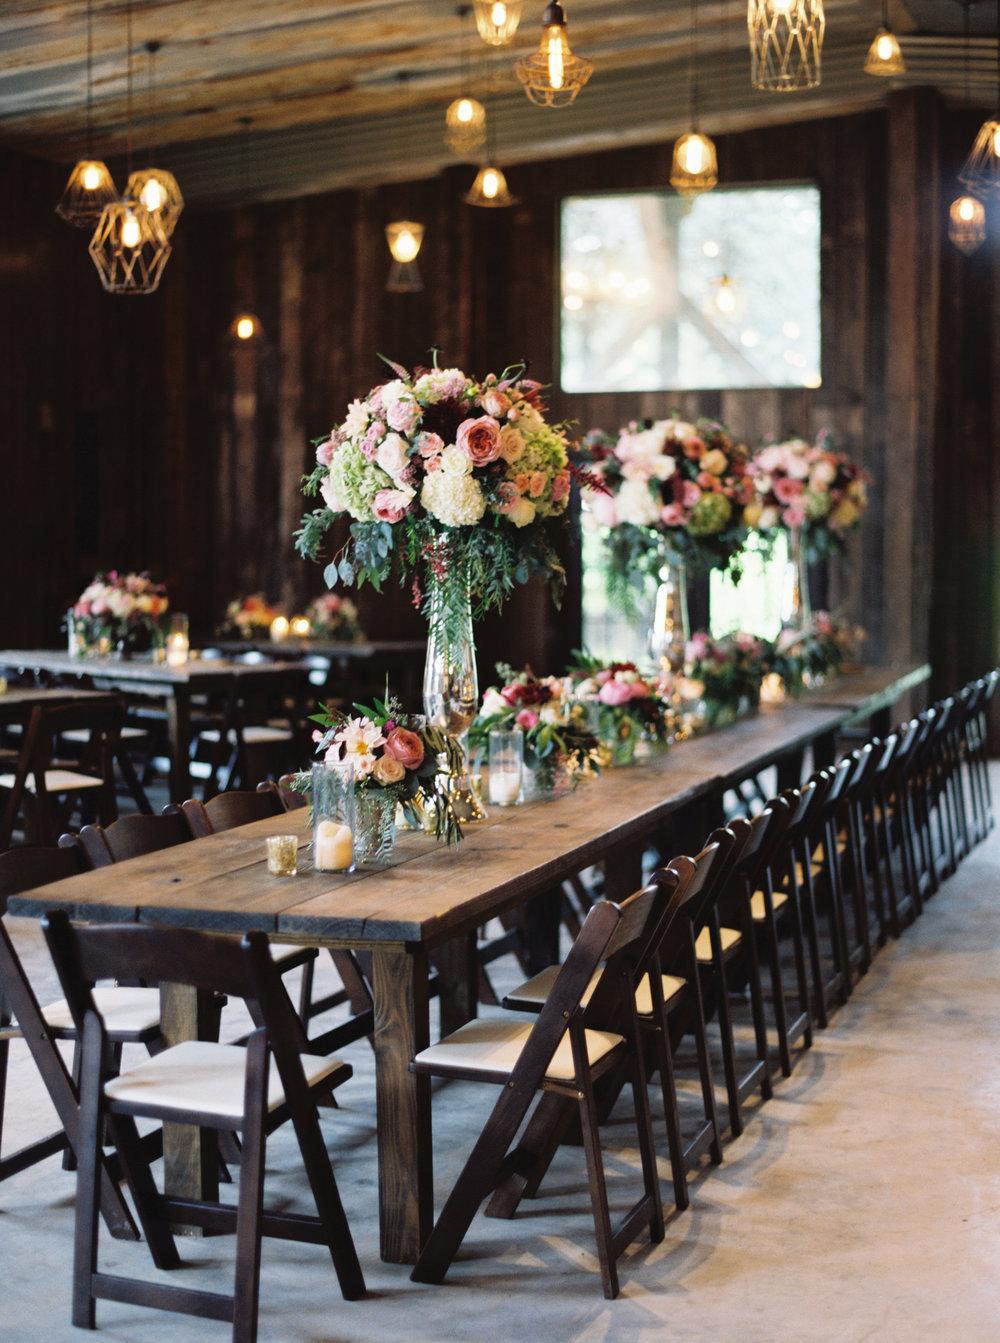 the-creek-haus-wedding-weekend-destination-austin-texas-barn-reception-decor